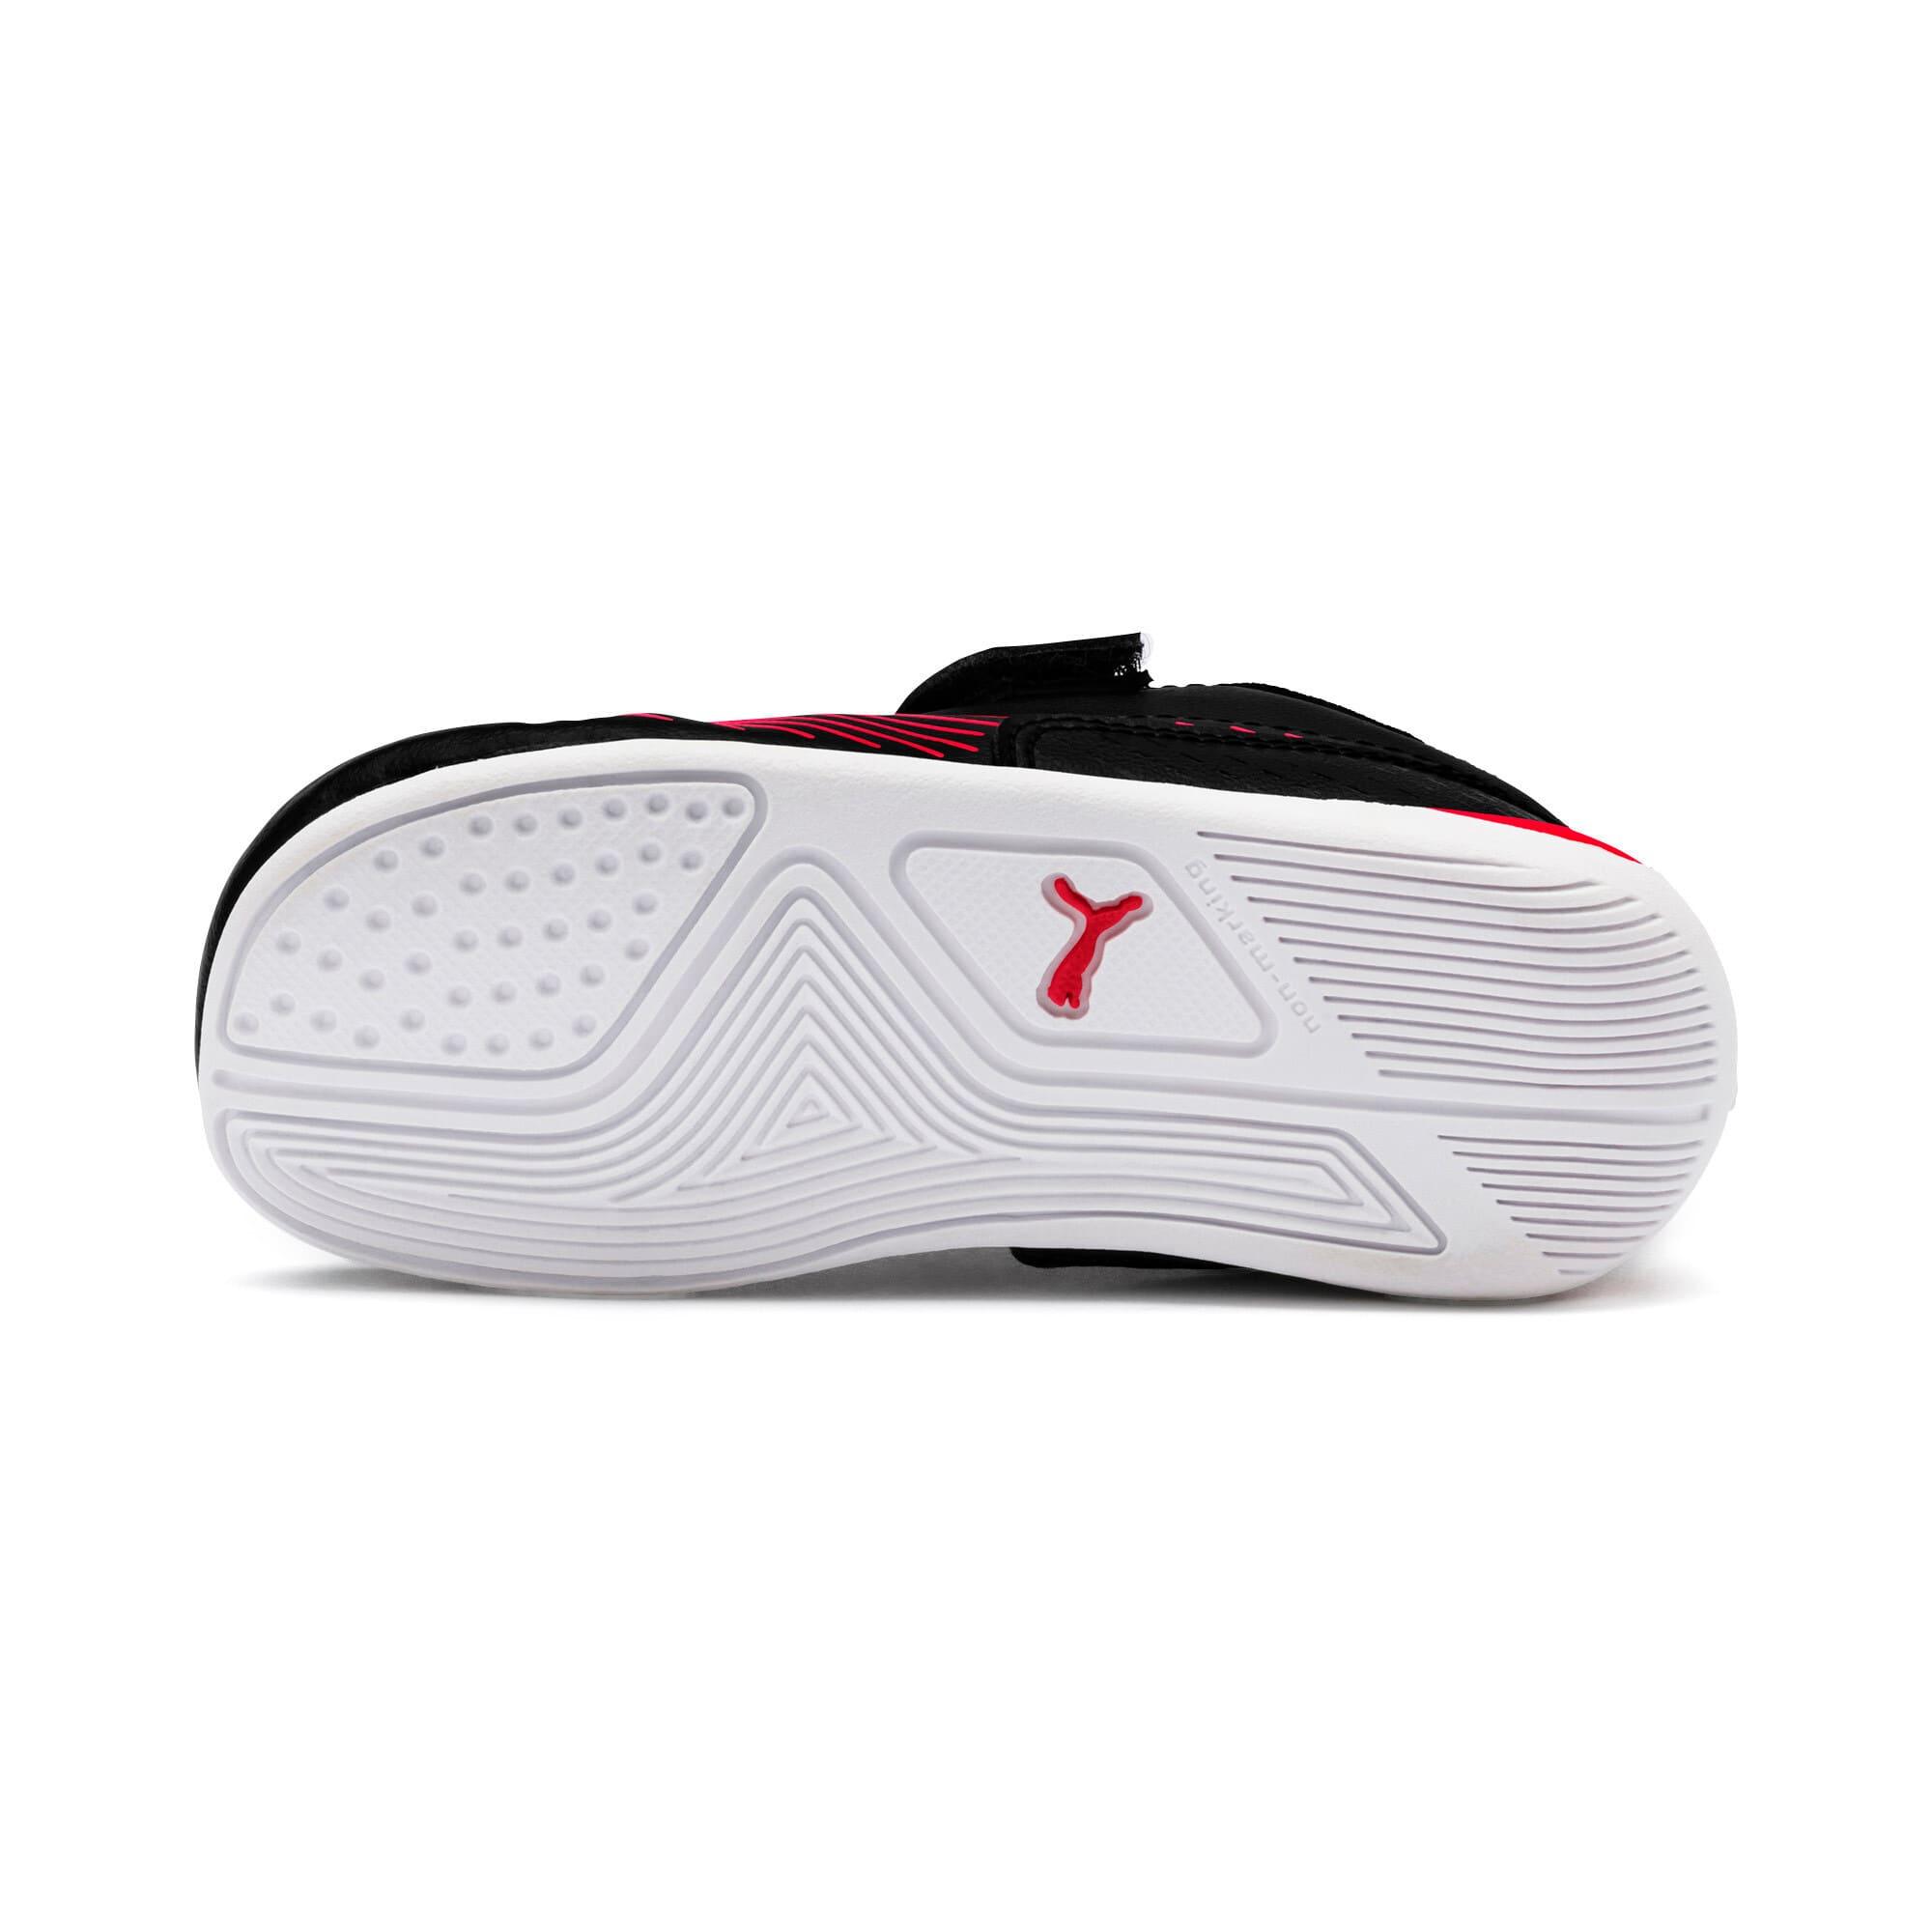 Thumbnail 4 of Ferrari Drift Cat 7S Ultra Kids Sneaker, Puma Black-Rosso Corsa, medium